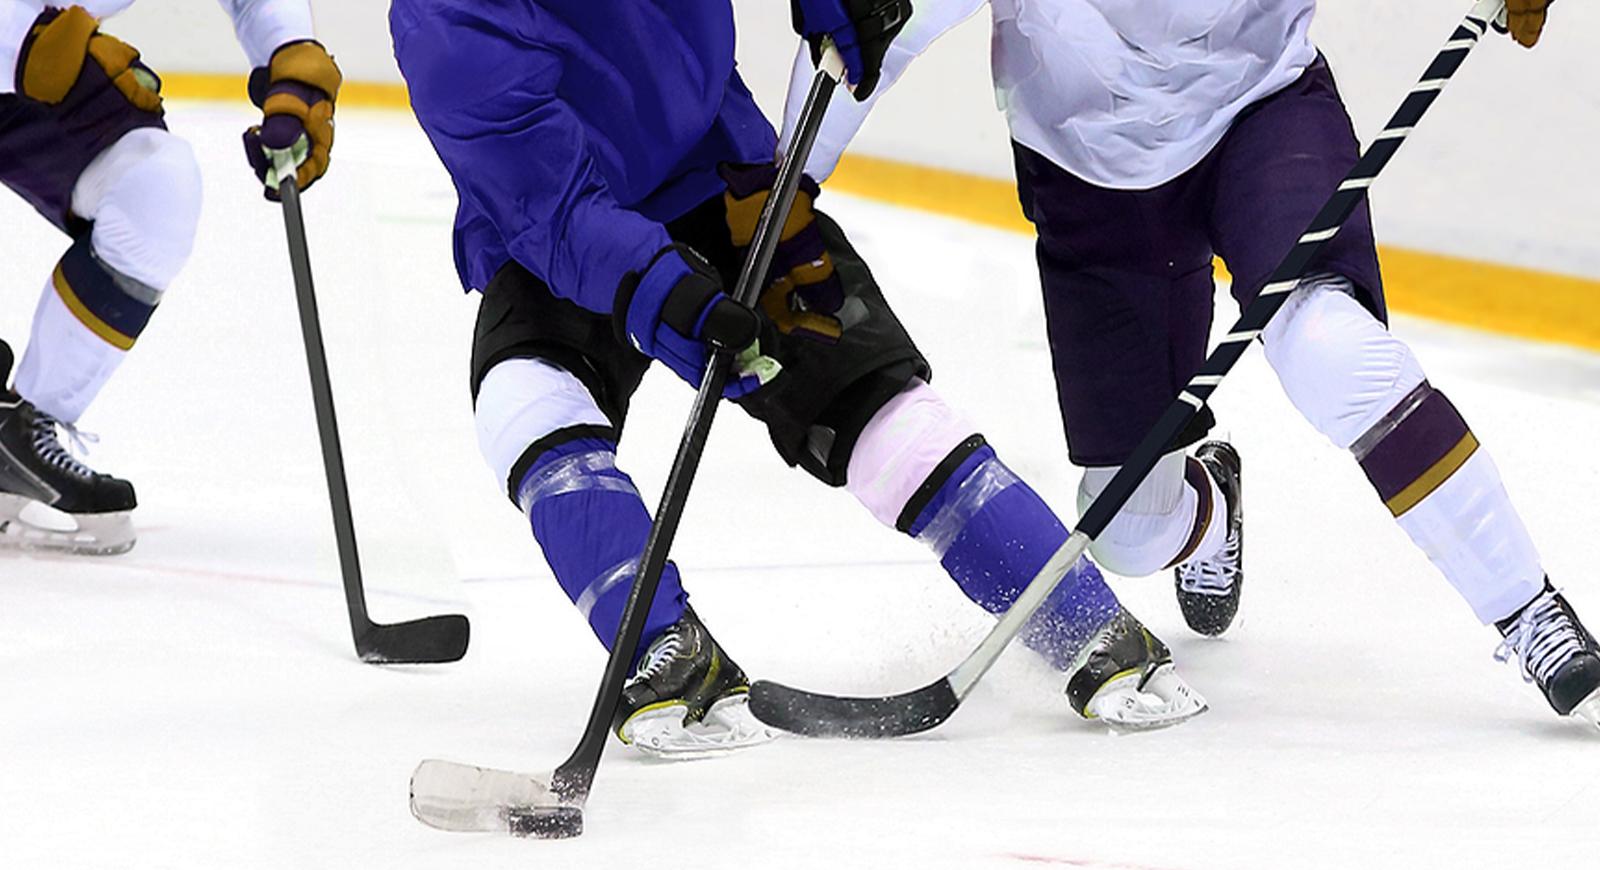 hockeyplayers-stockphoto